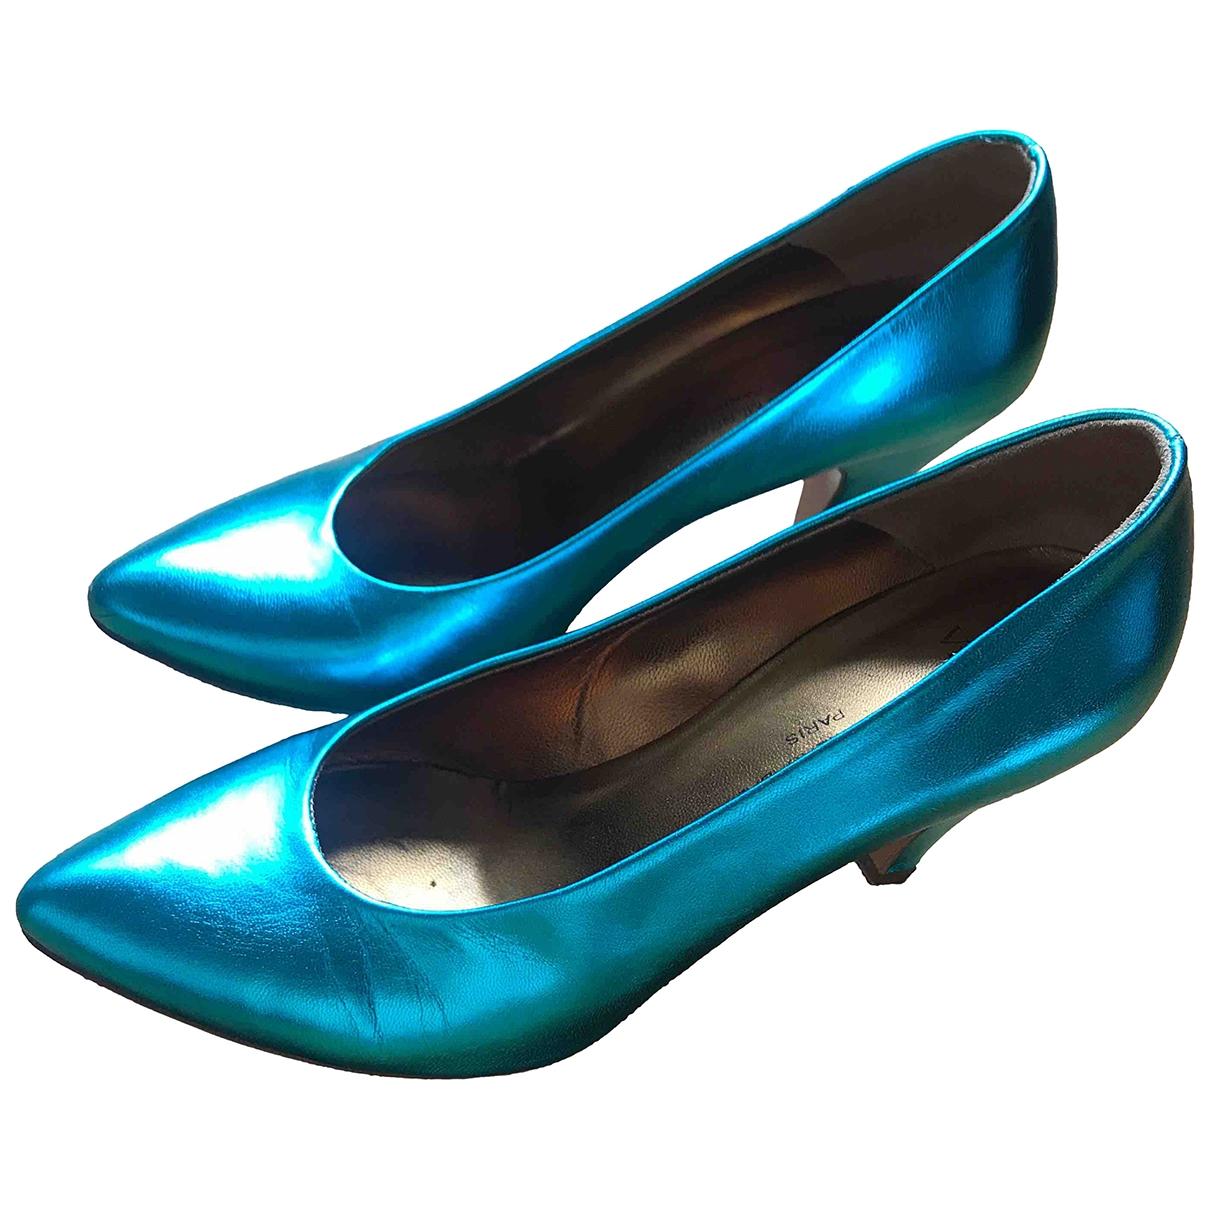 Atelier Mercadal \N Turquoise Leather Heels for Women 37 EU